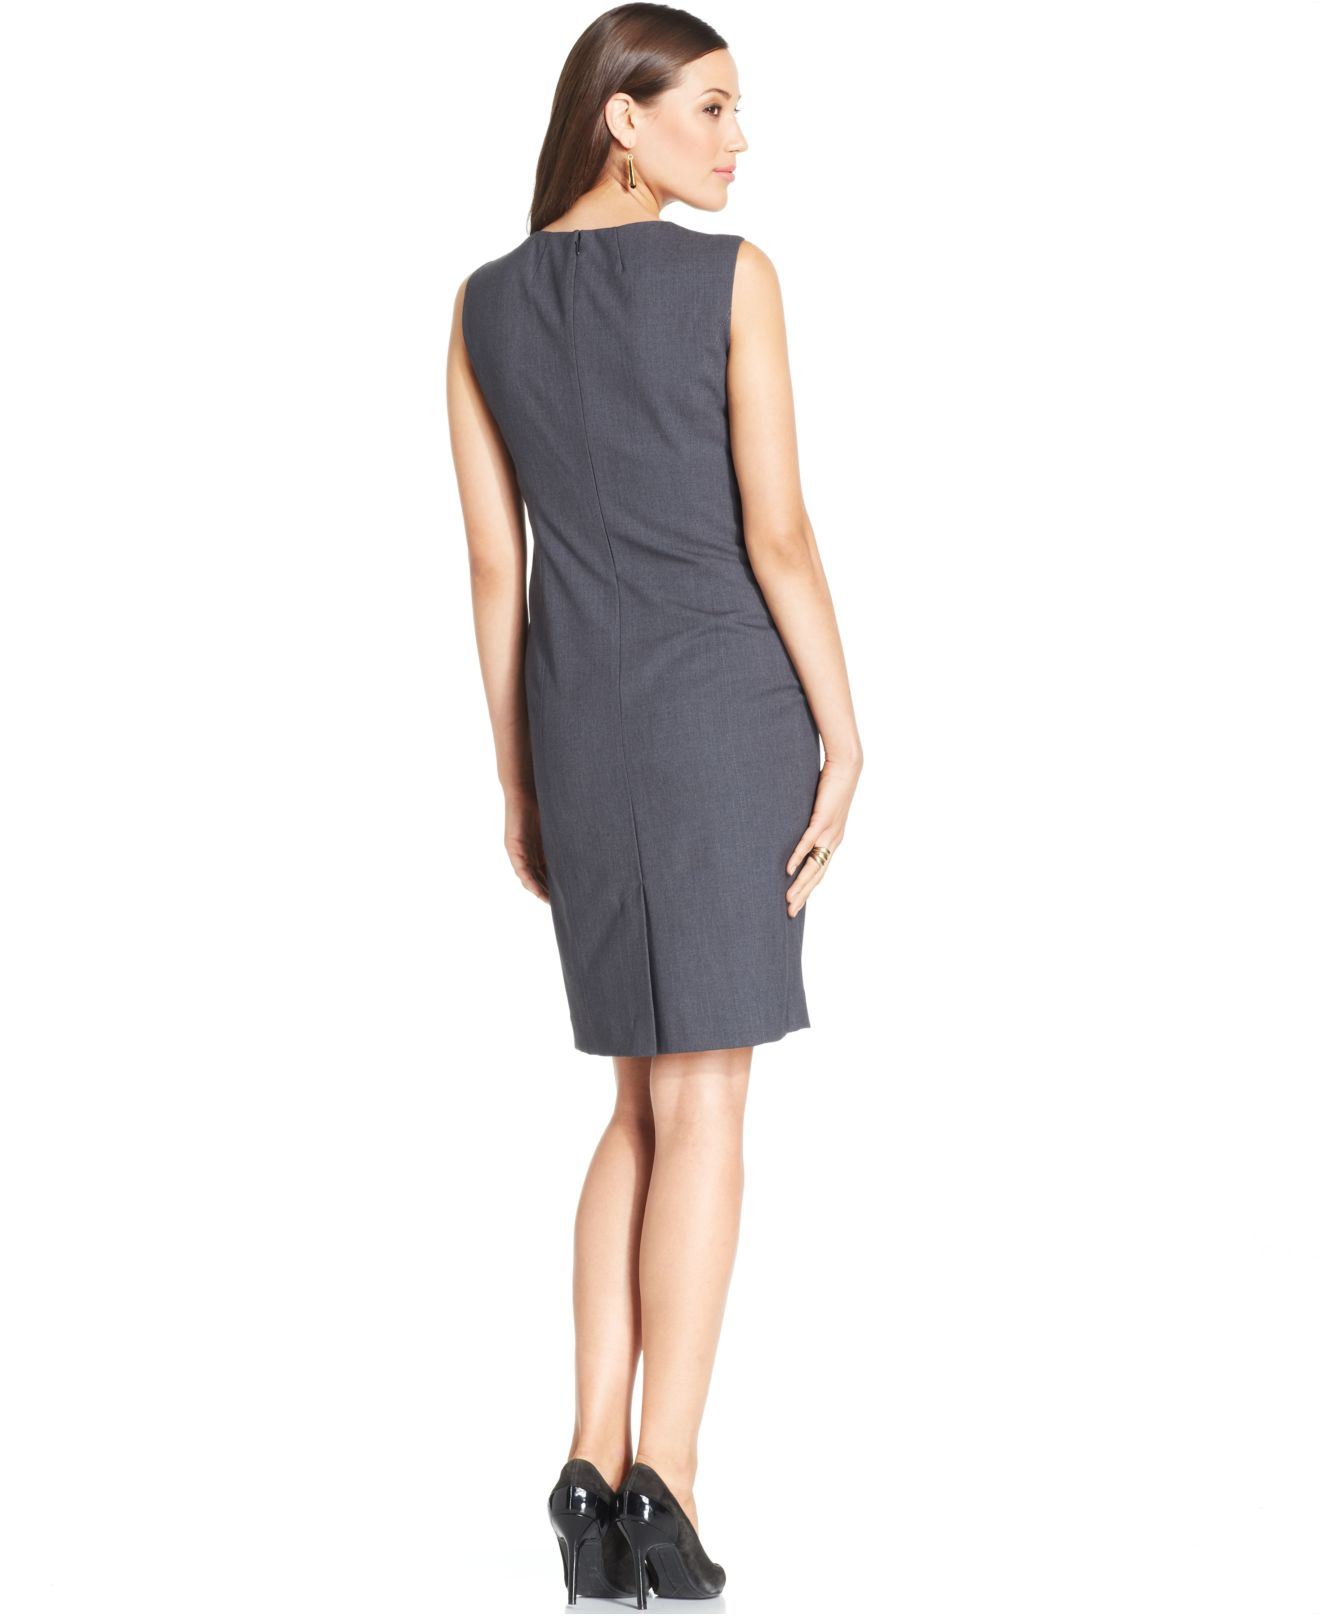 b4ec8c50 Jones New York Sleeveless Seamed Sheath Dress in Gray - Lyst